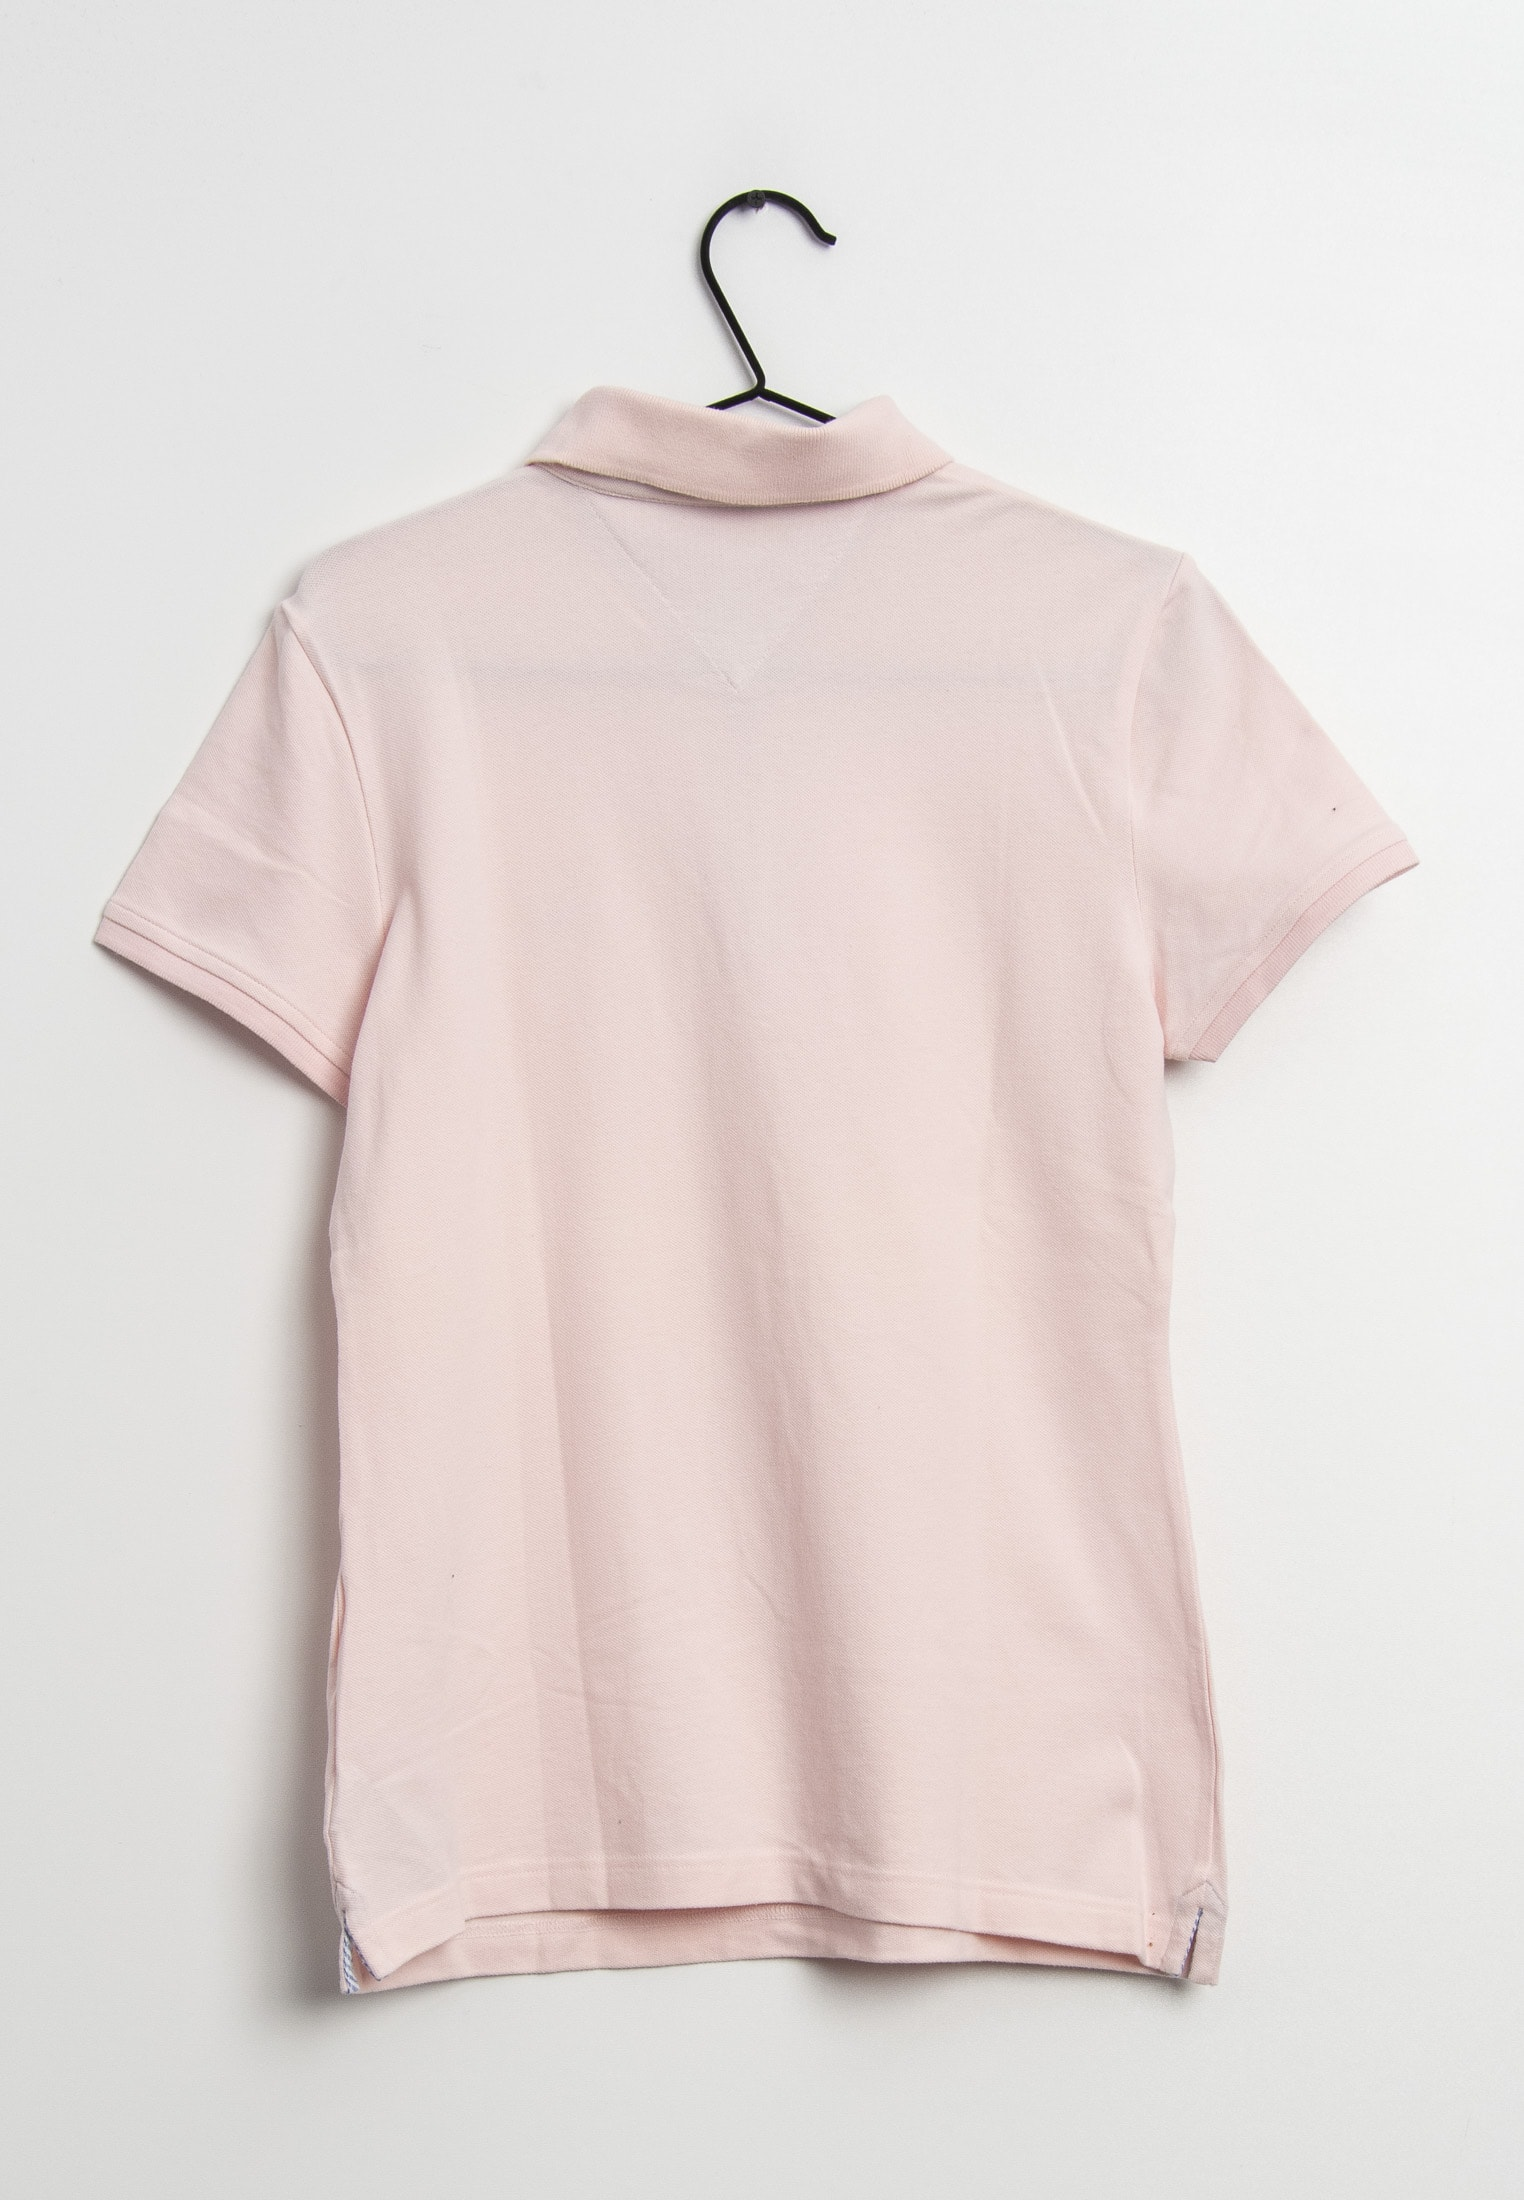 Tommy Hilfiger T-Shirt Pink Gr.L